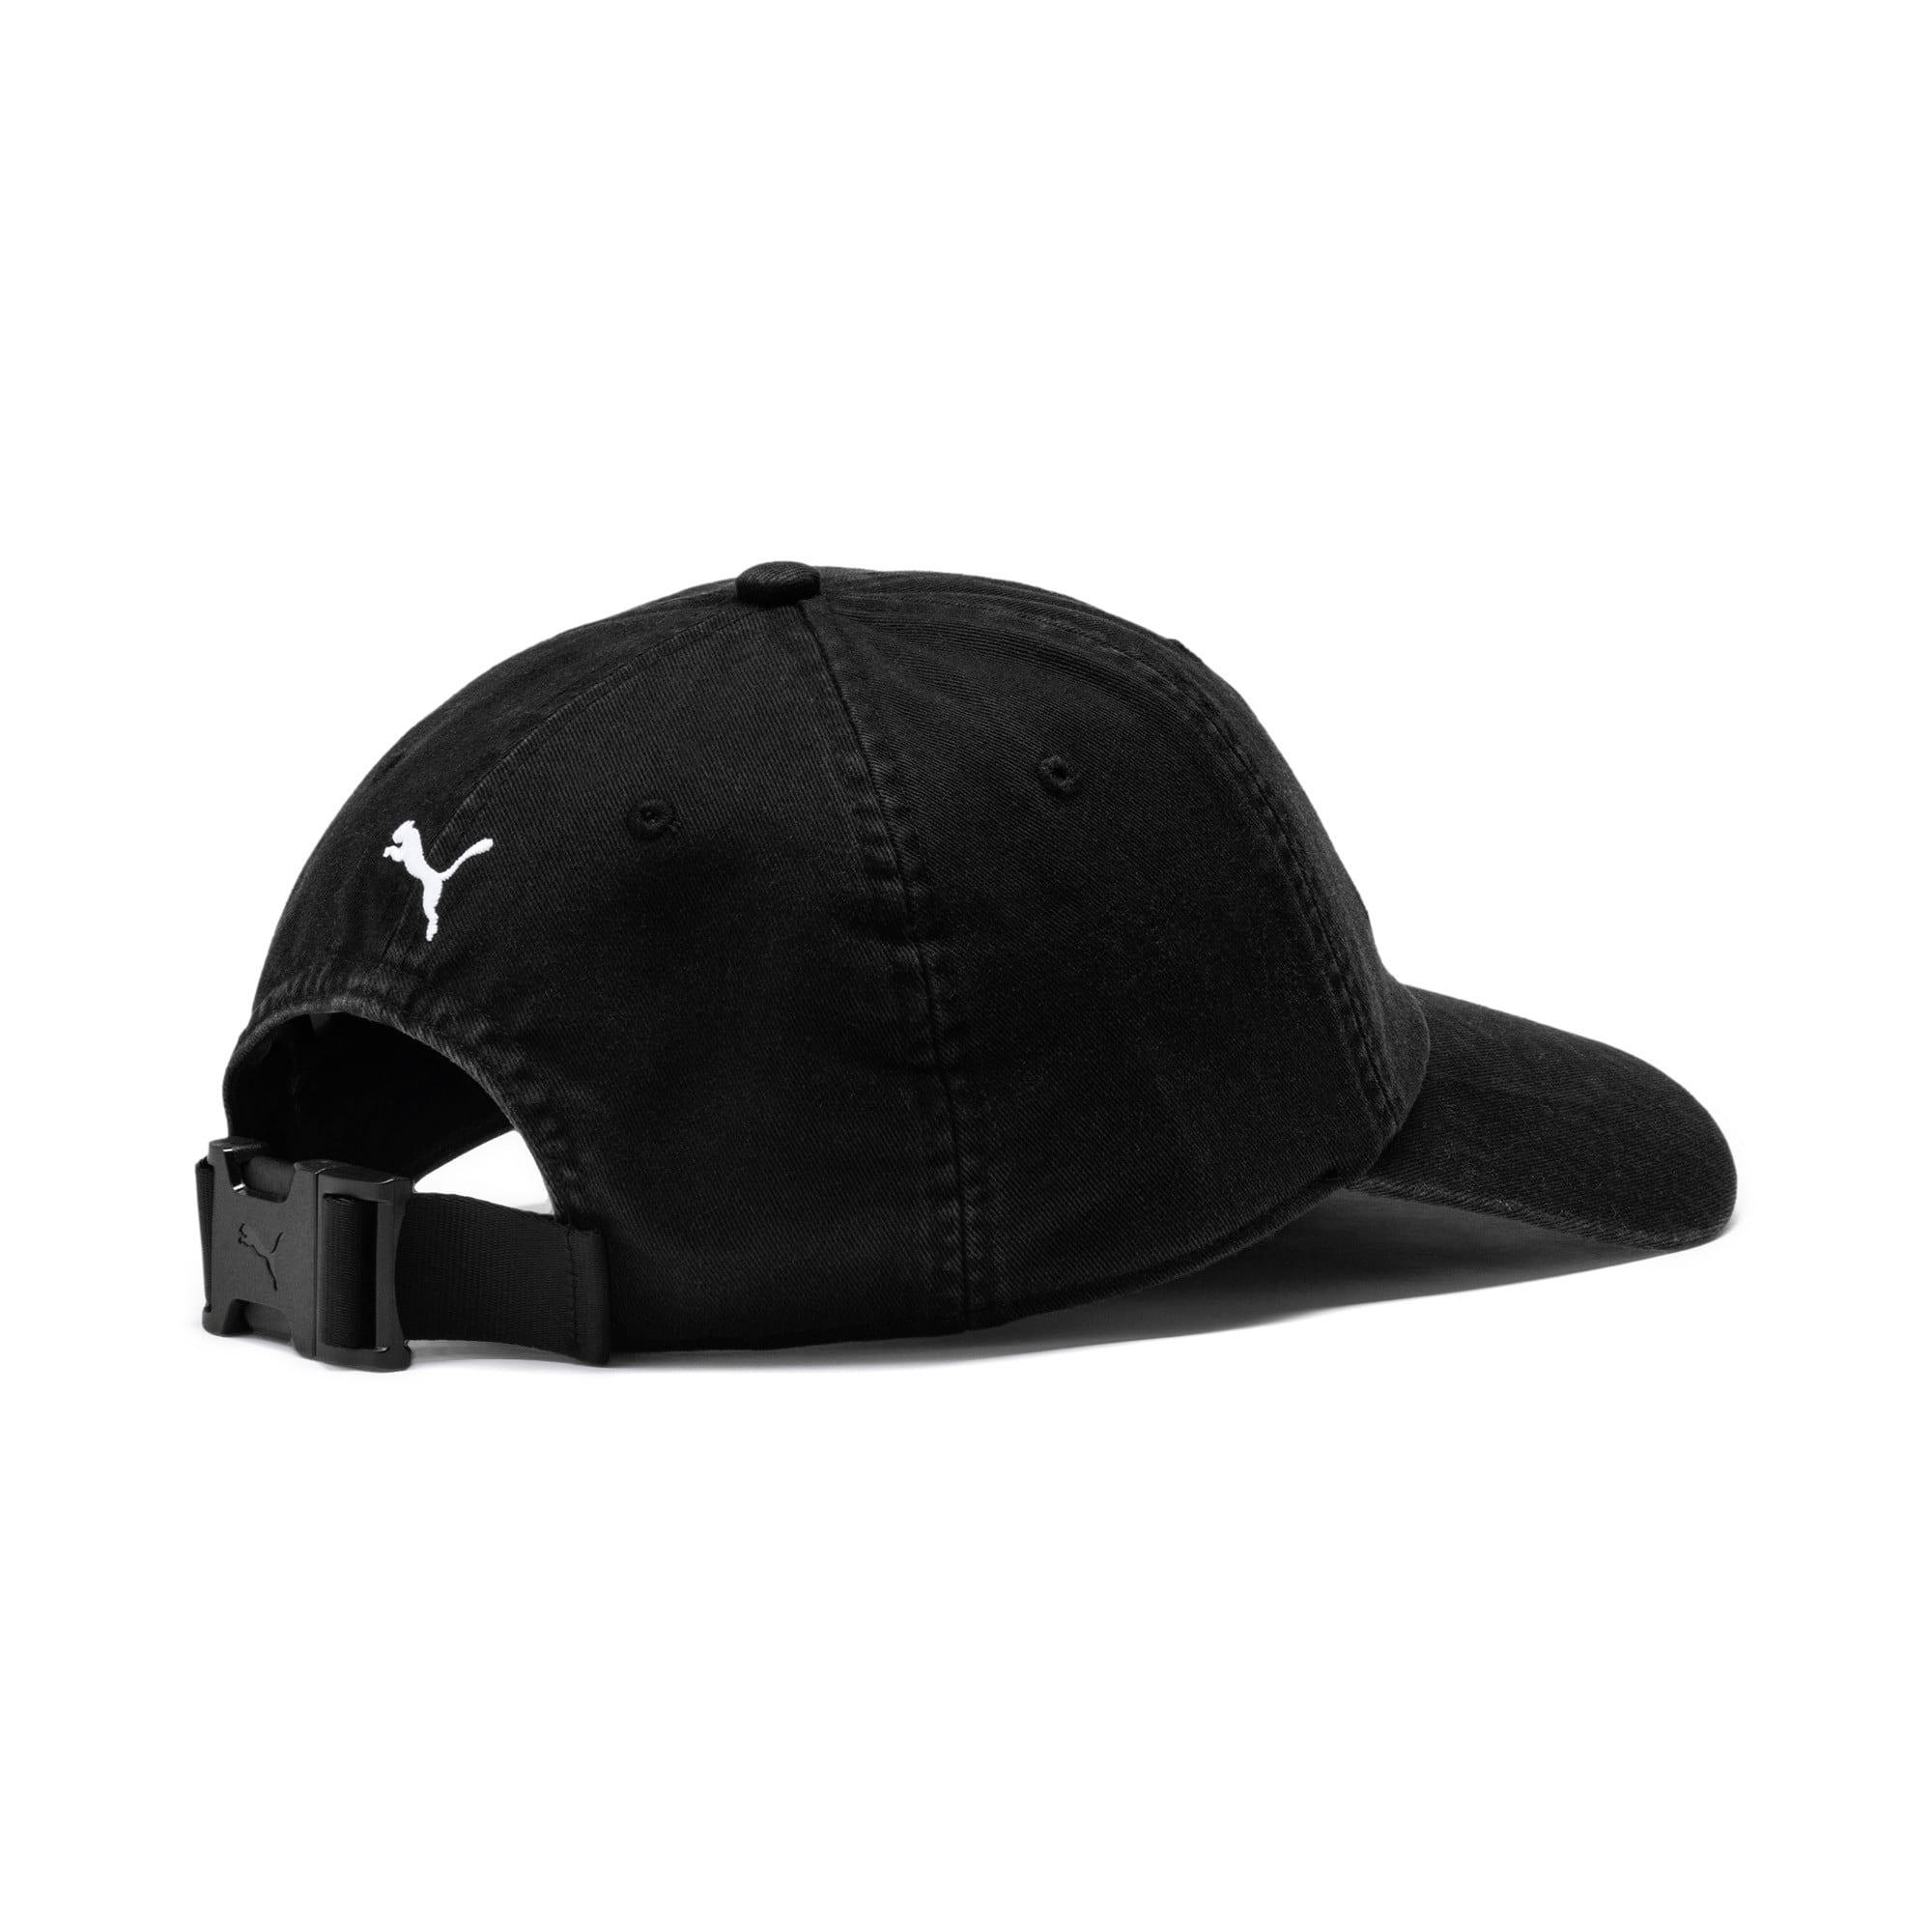 Thumbnail 8 of PUMA x SANKUANZ Baseball Cap, Puma Black, medium